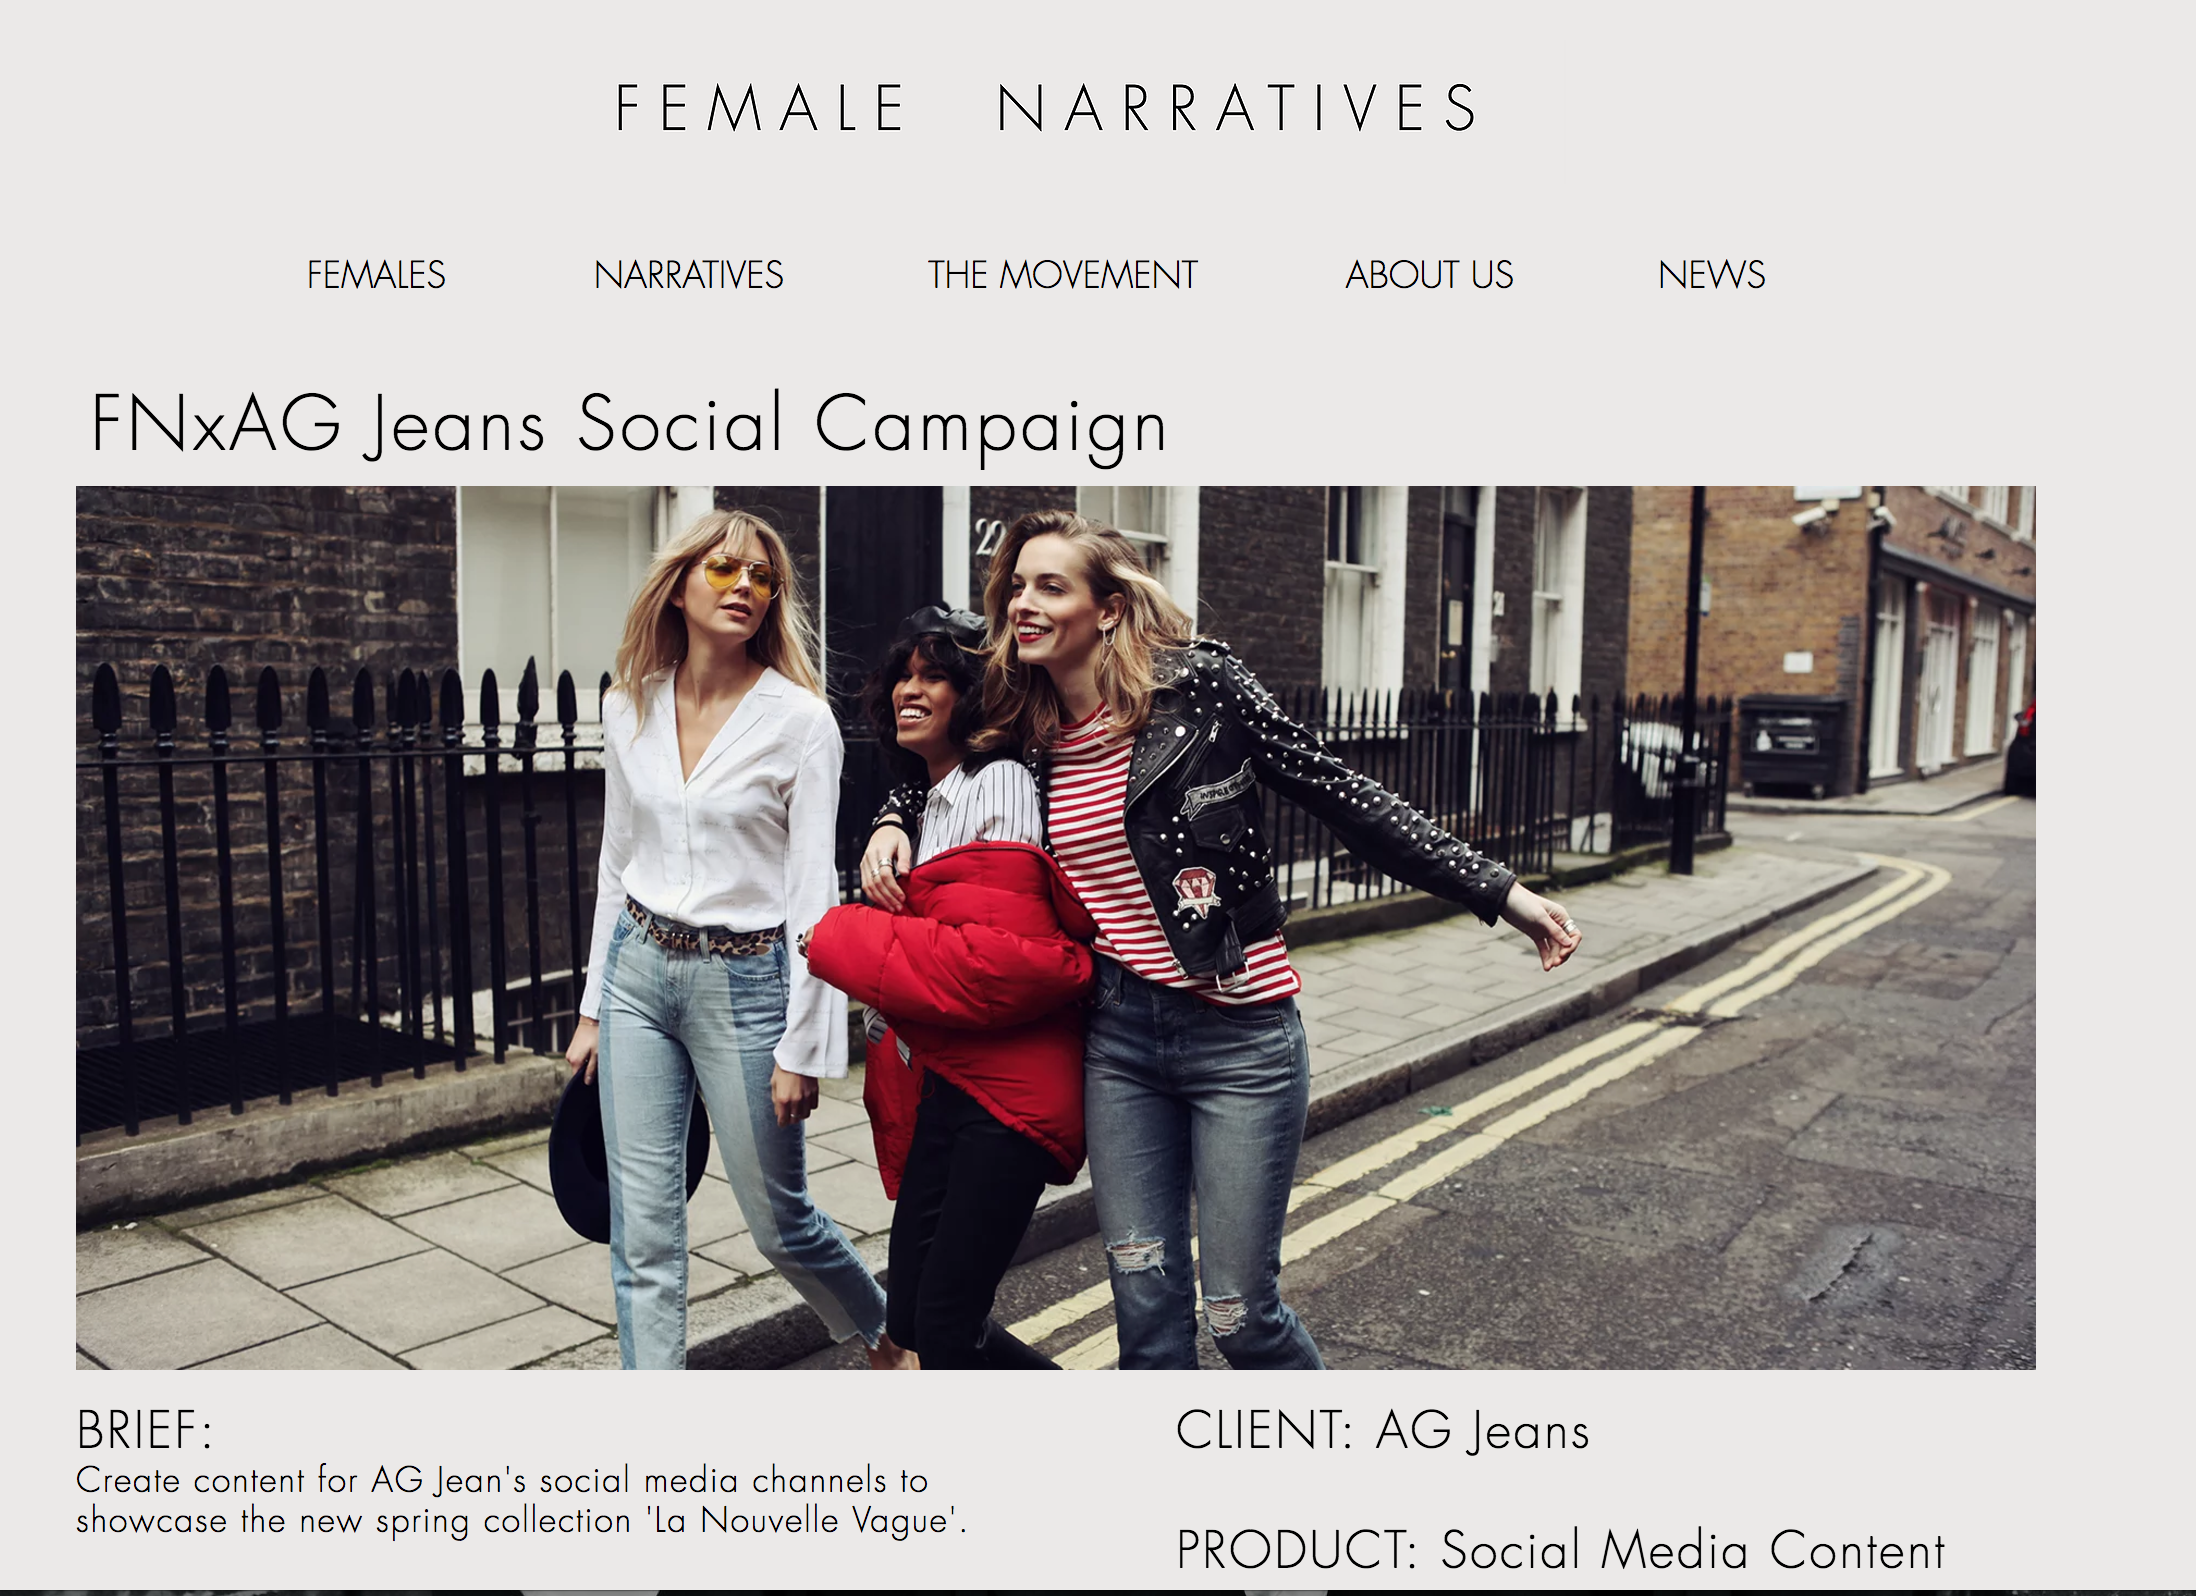 www.femalenarratives.com/fnxagjeans